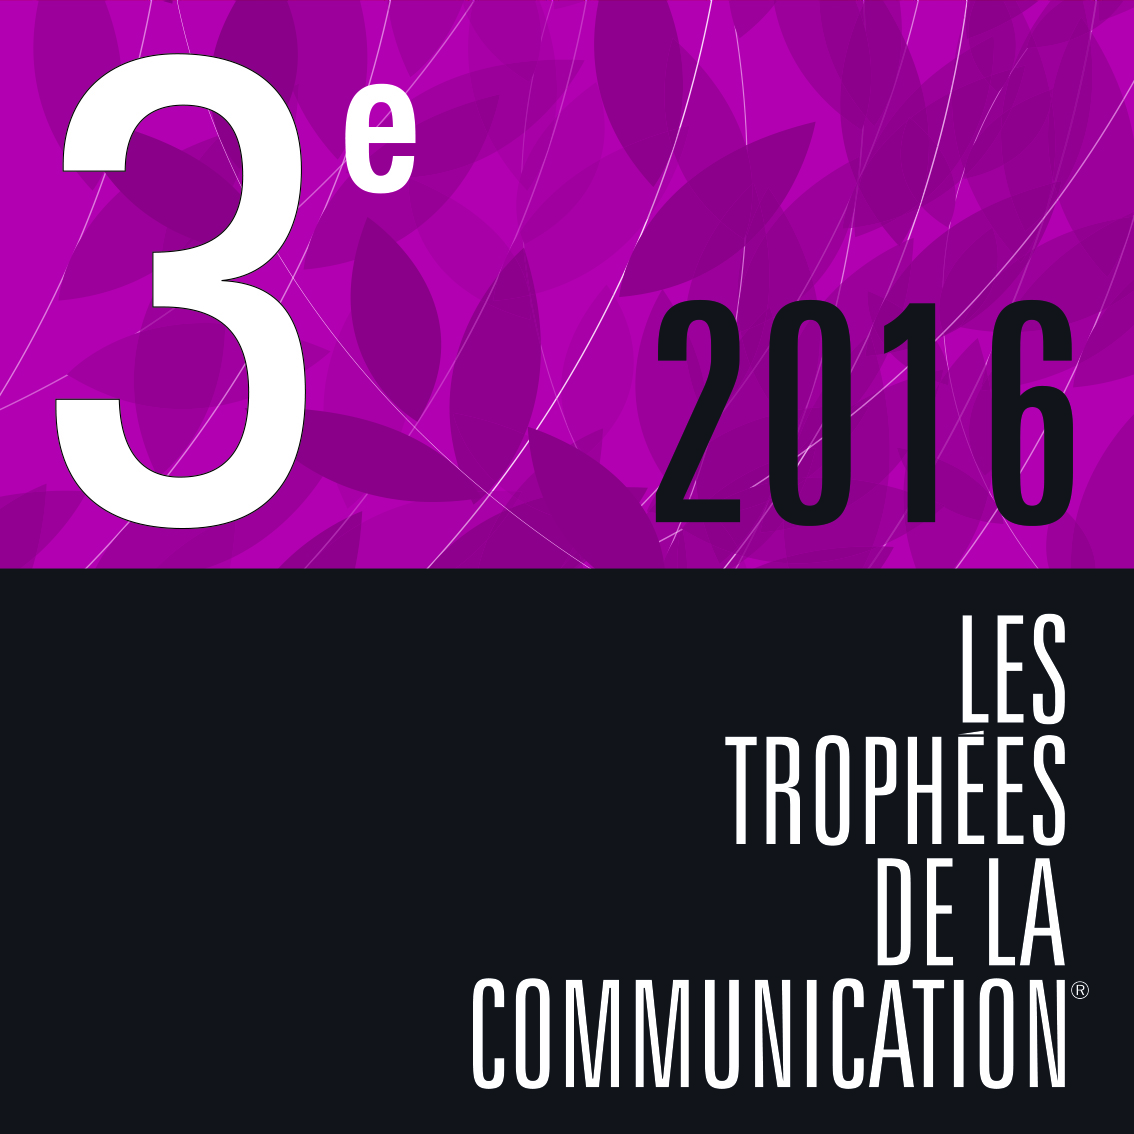 logo-3-2016